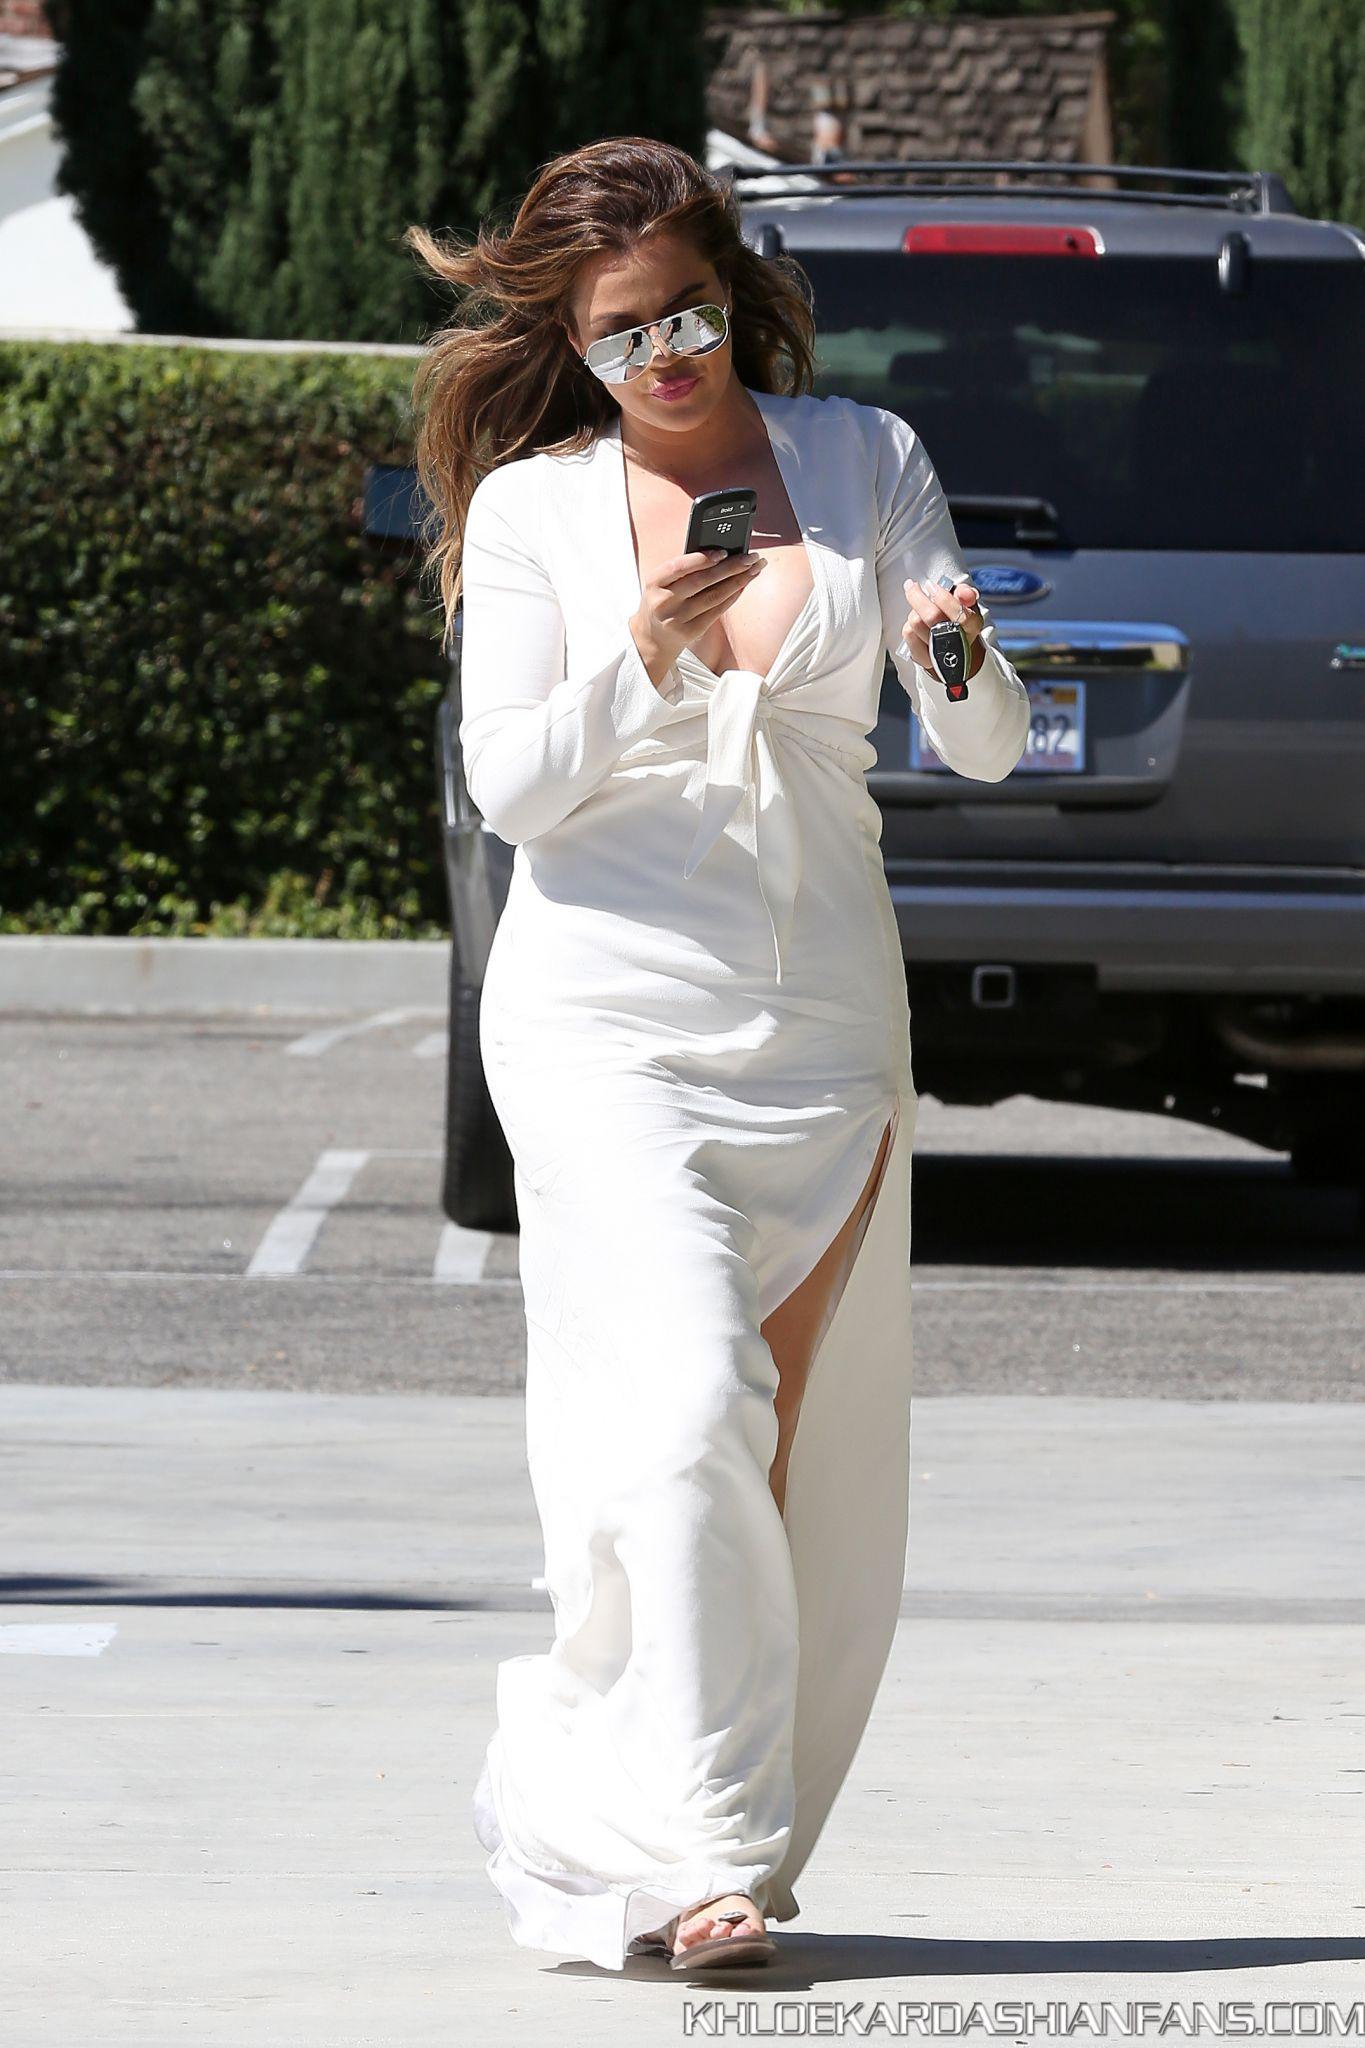 Khloe Kardashian 2014 : Khloe Kardashian in White Dress -13